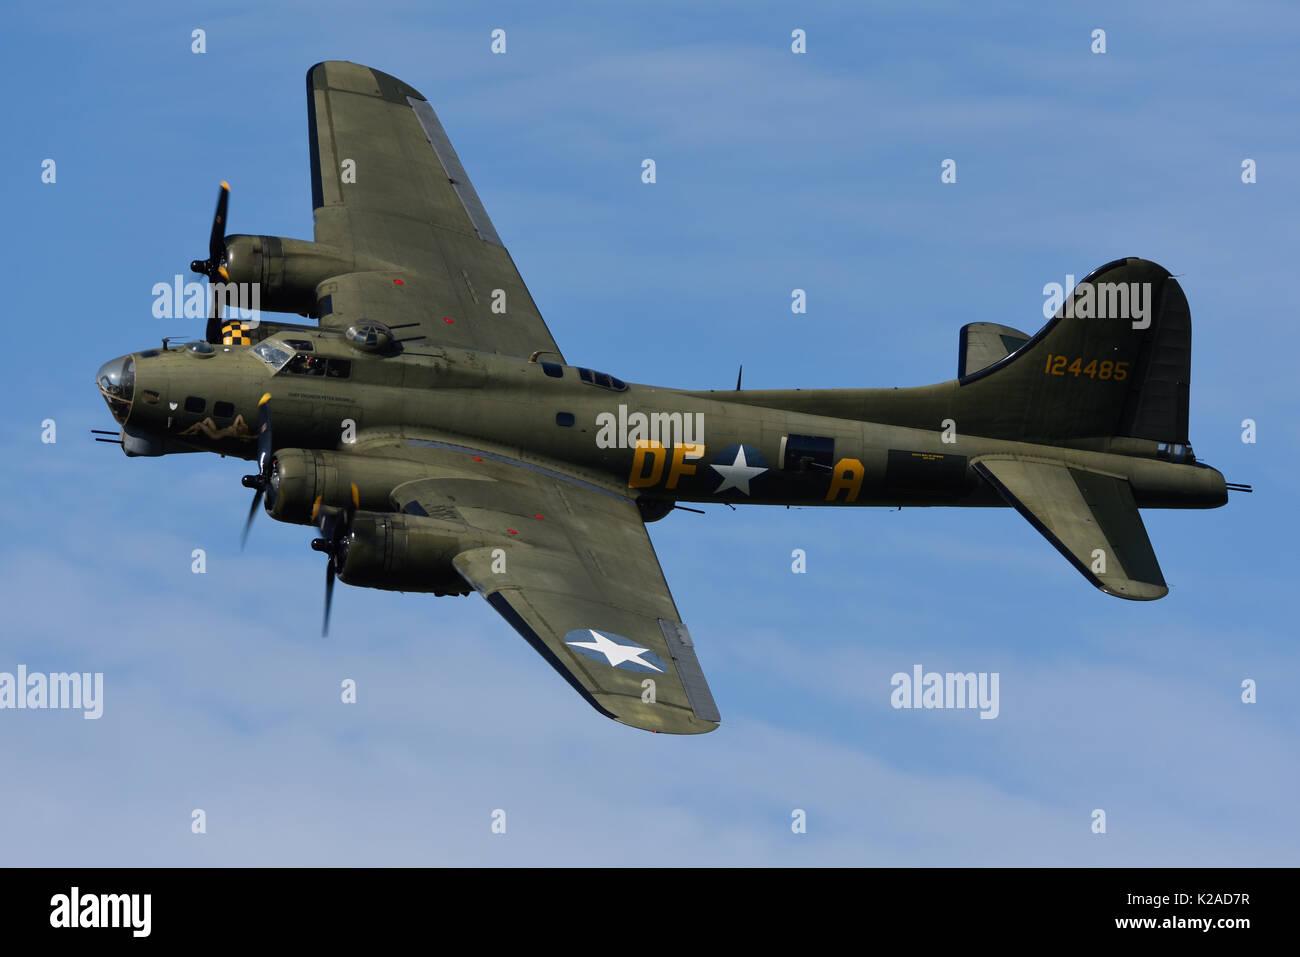 boeing b 17 flying fortress sally b second world war bomber plane